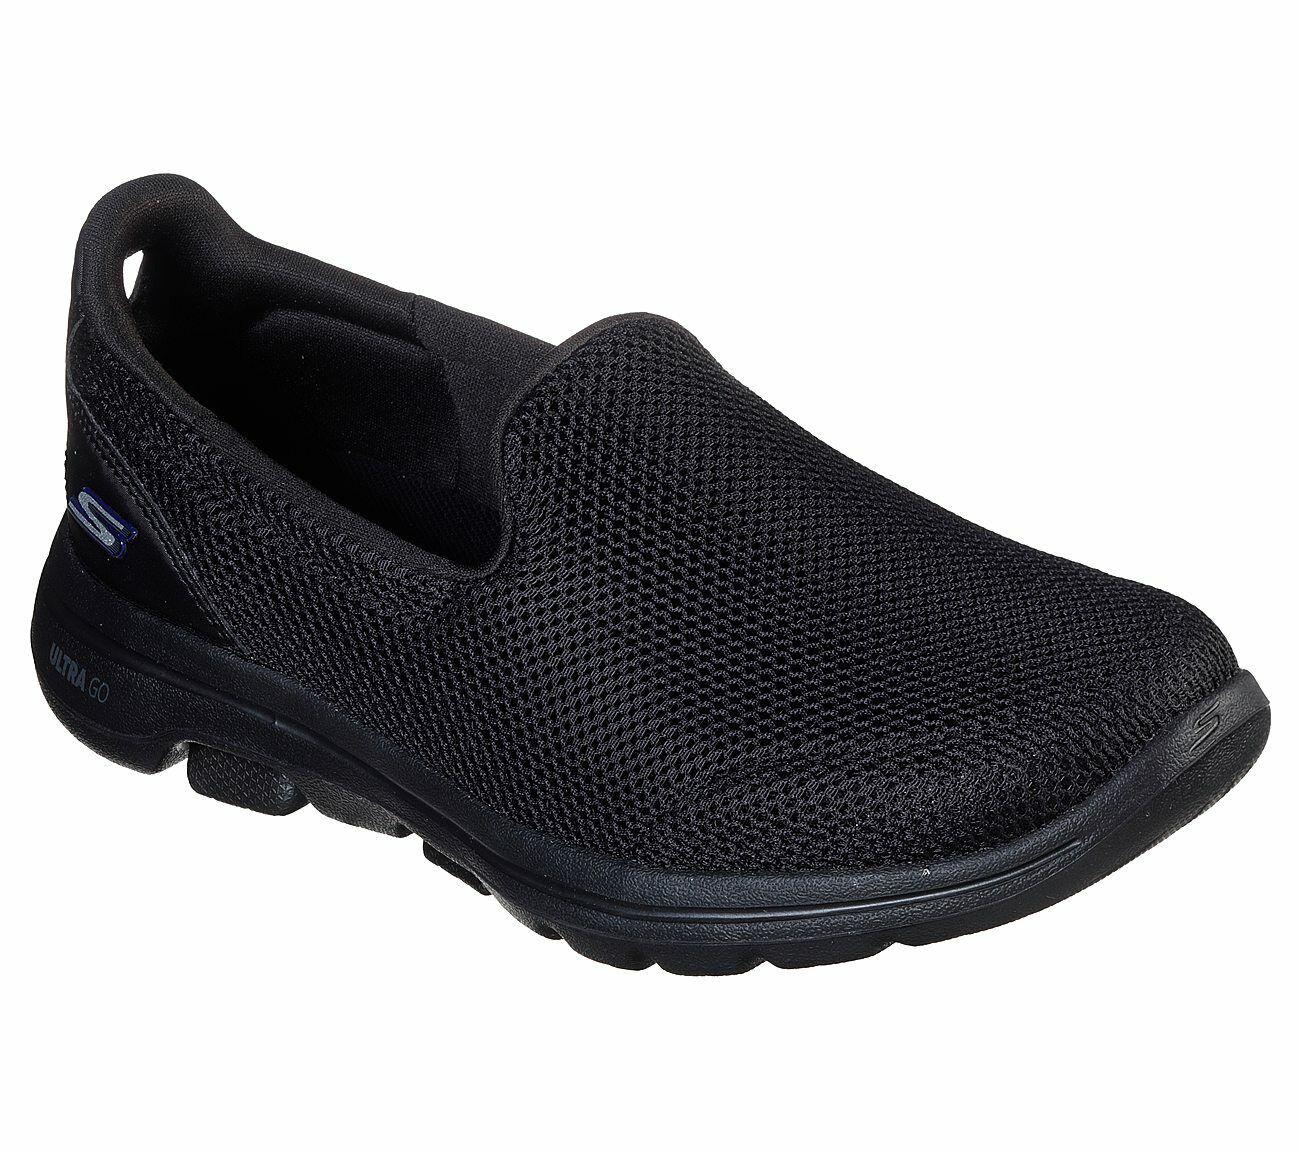 sketcher zapatos usa youtube